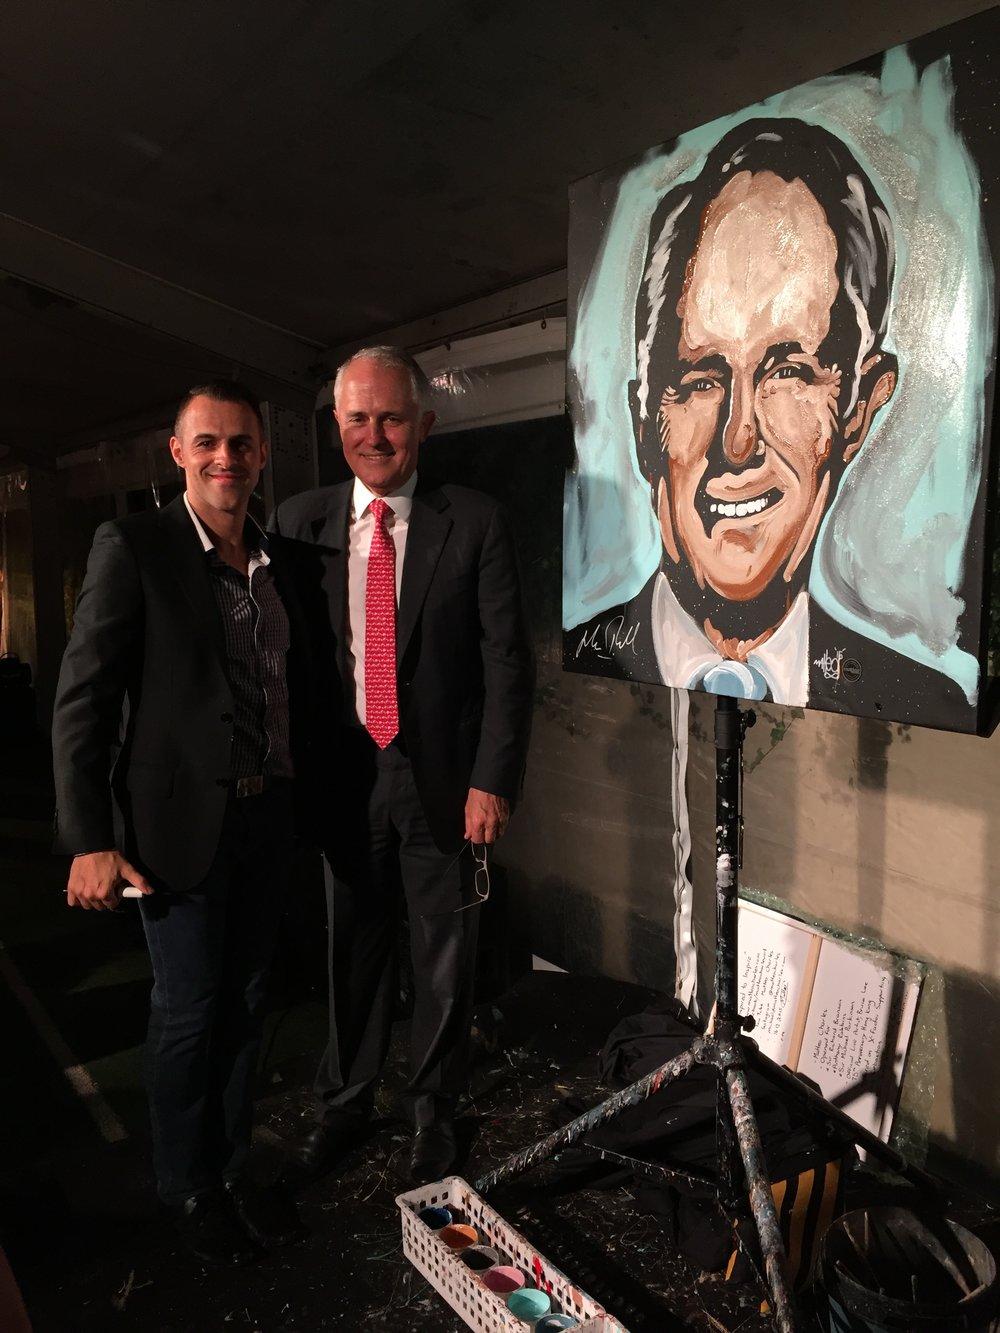 Malcolm Turnbull x Matteo Charles